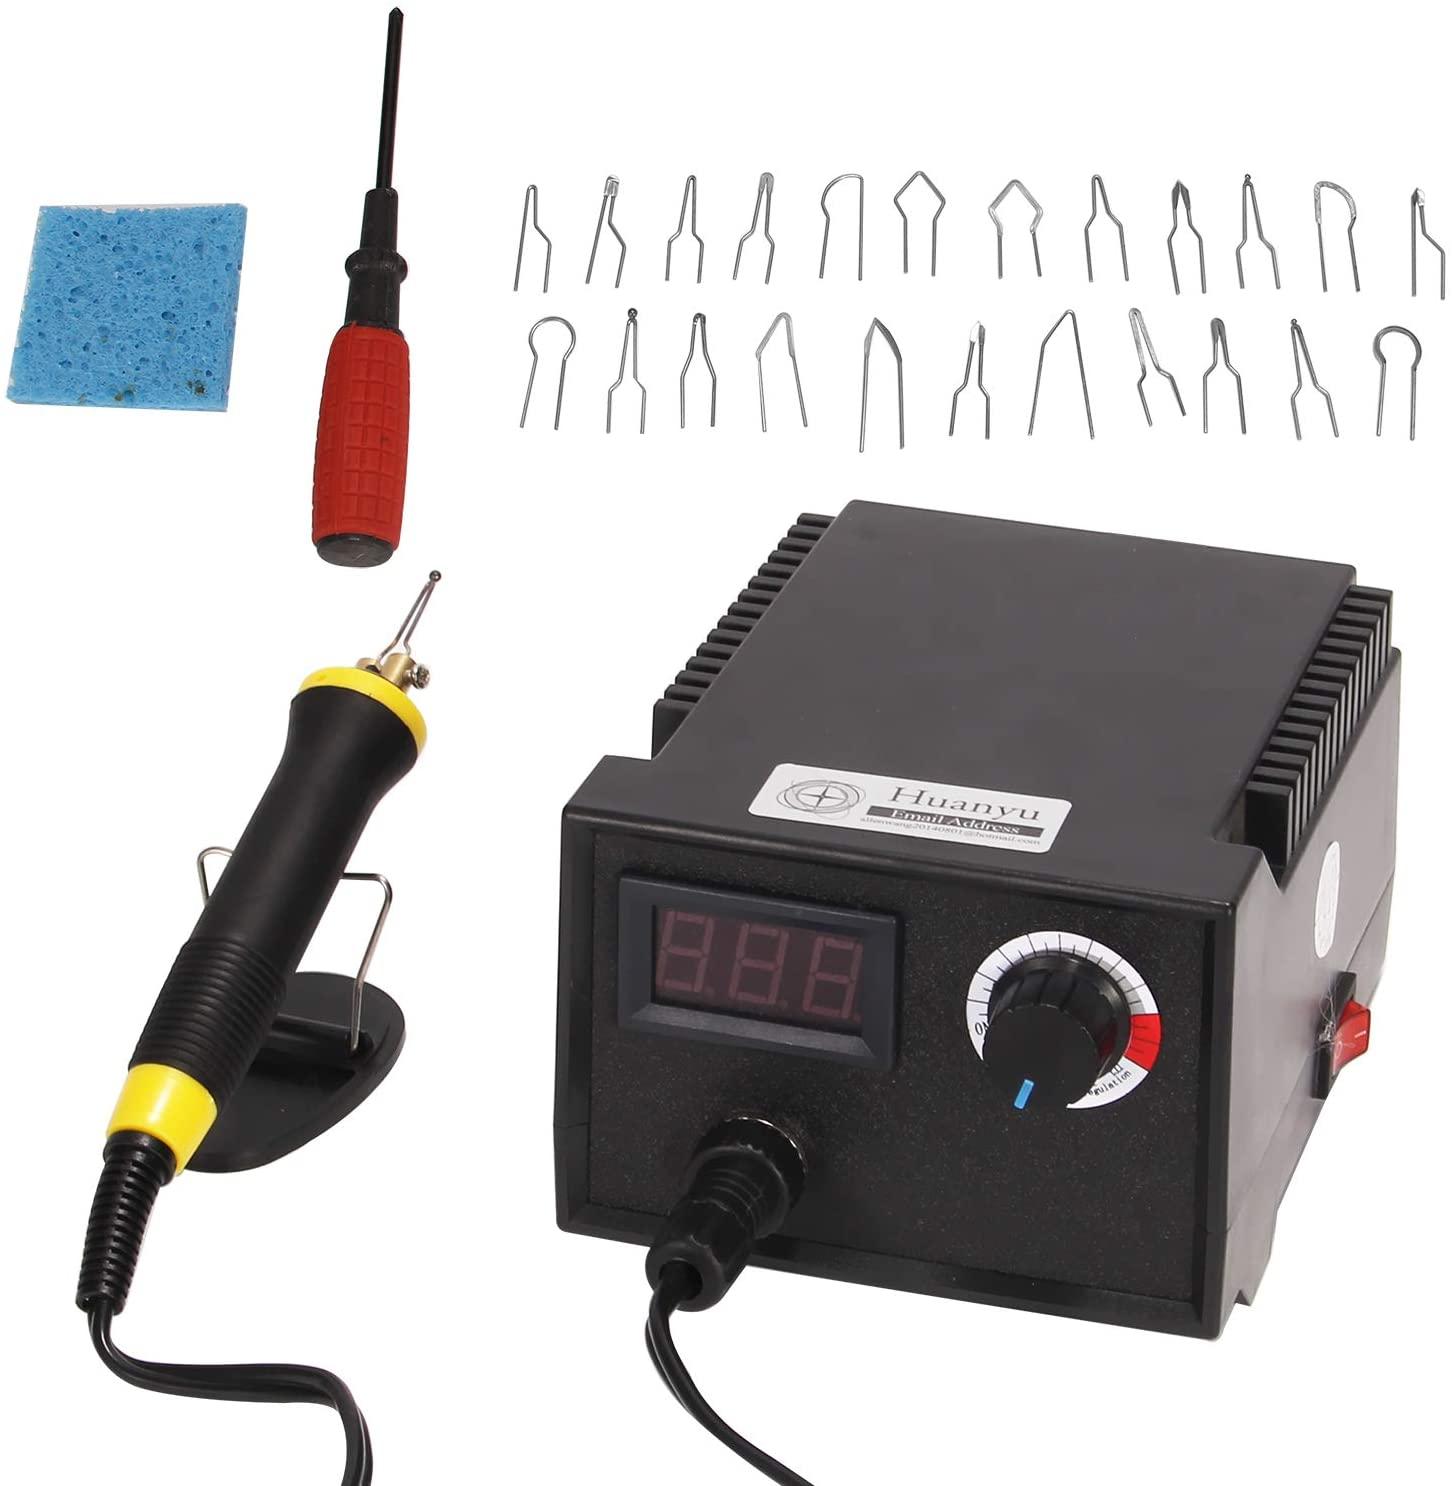 Huanyu Wood Burning Machine Kit 23 Tips 40W Pyrography Machine Digital Indicating Temperature Adjustment Multifunction Wood Craft Tool Set (110V, with Ordinary Pen Holder)